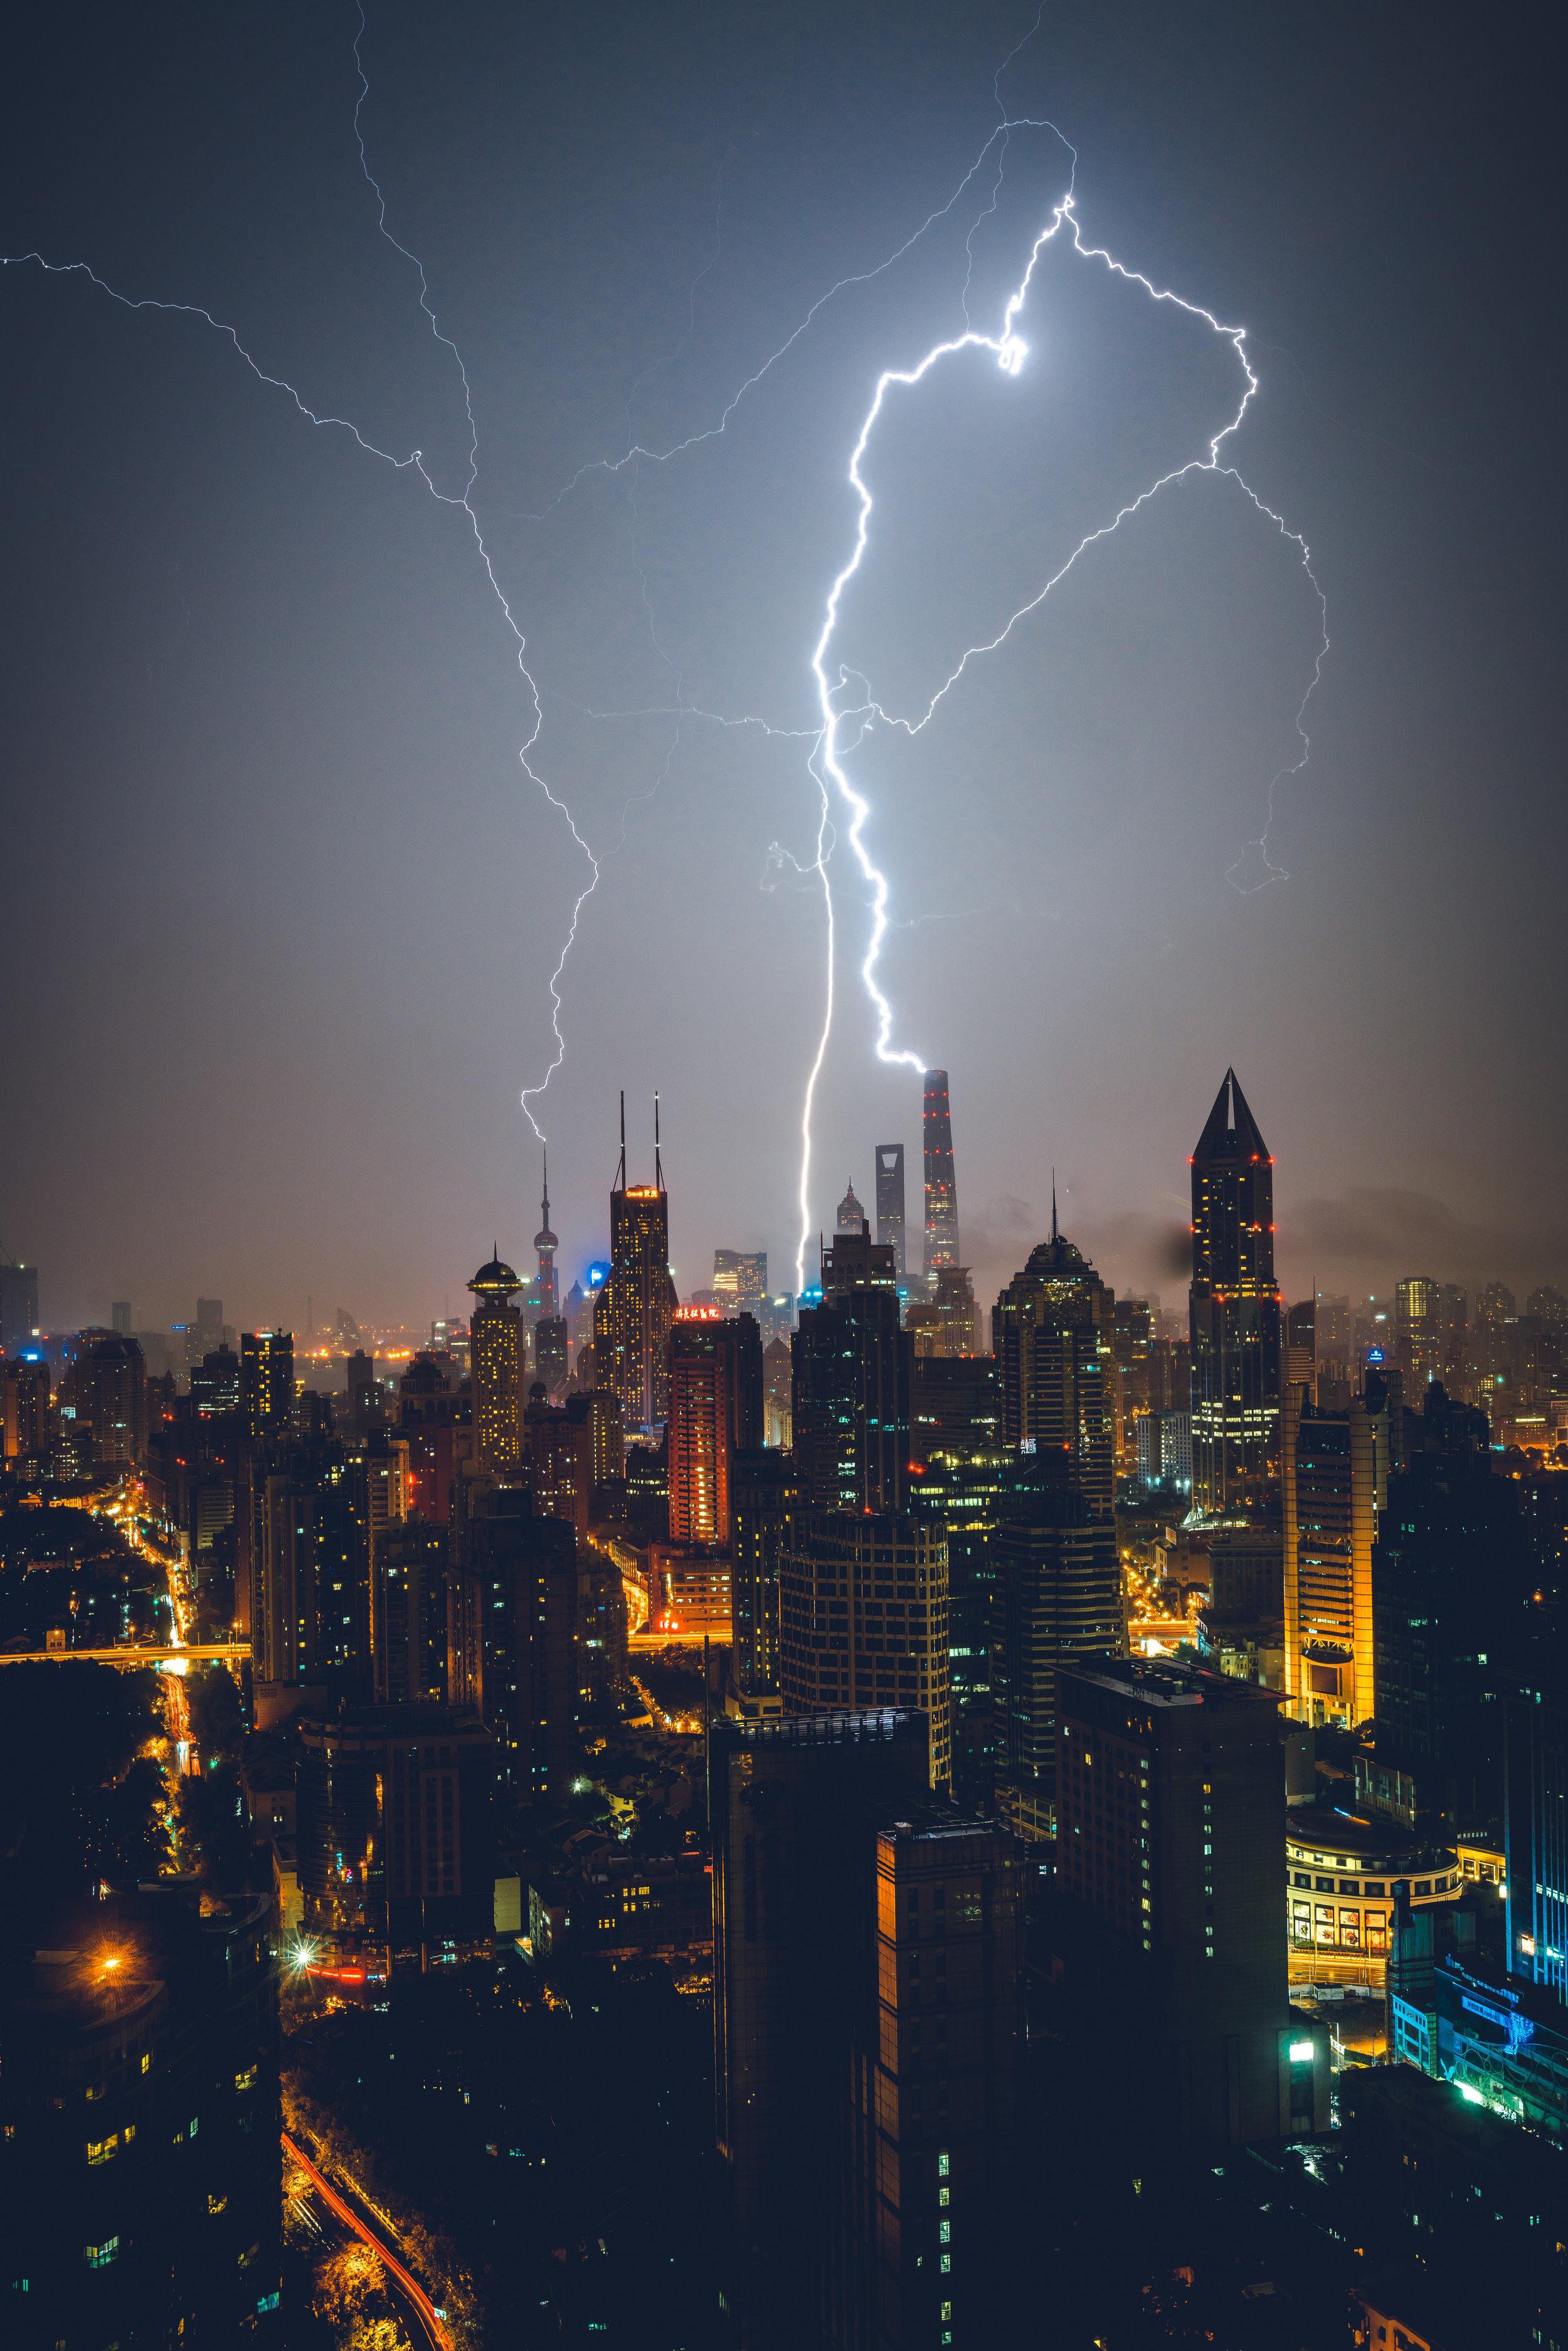 lightning-strikes-twice-twice.jpg